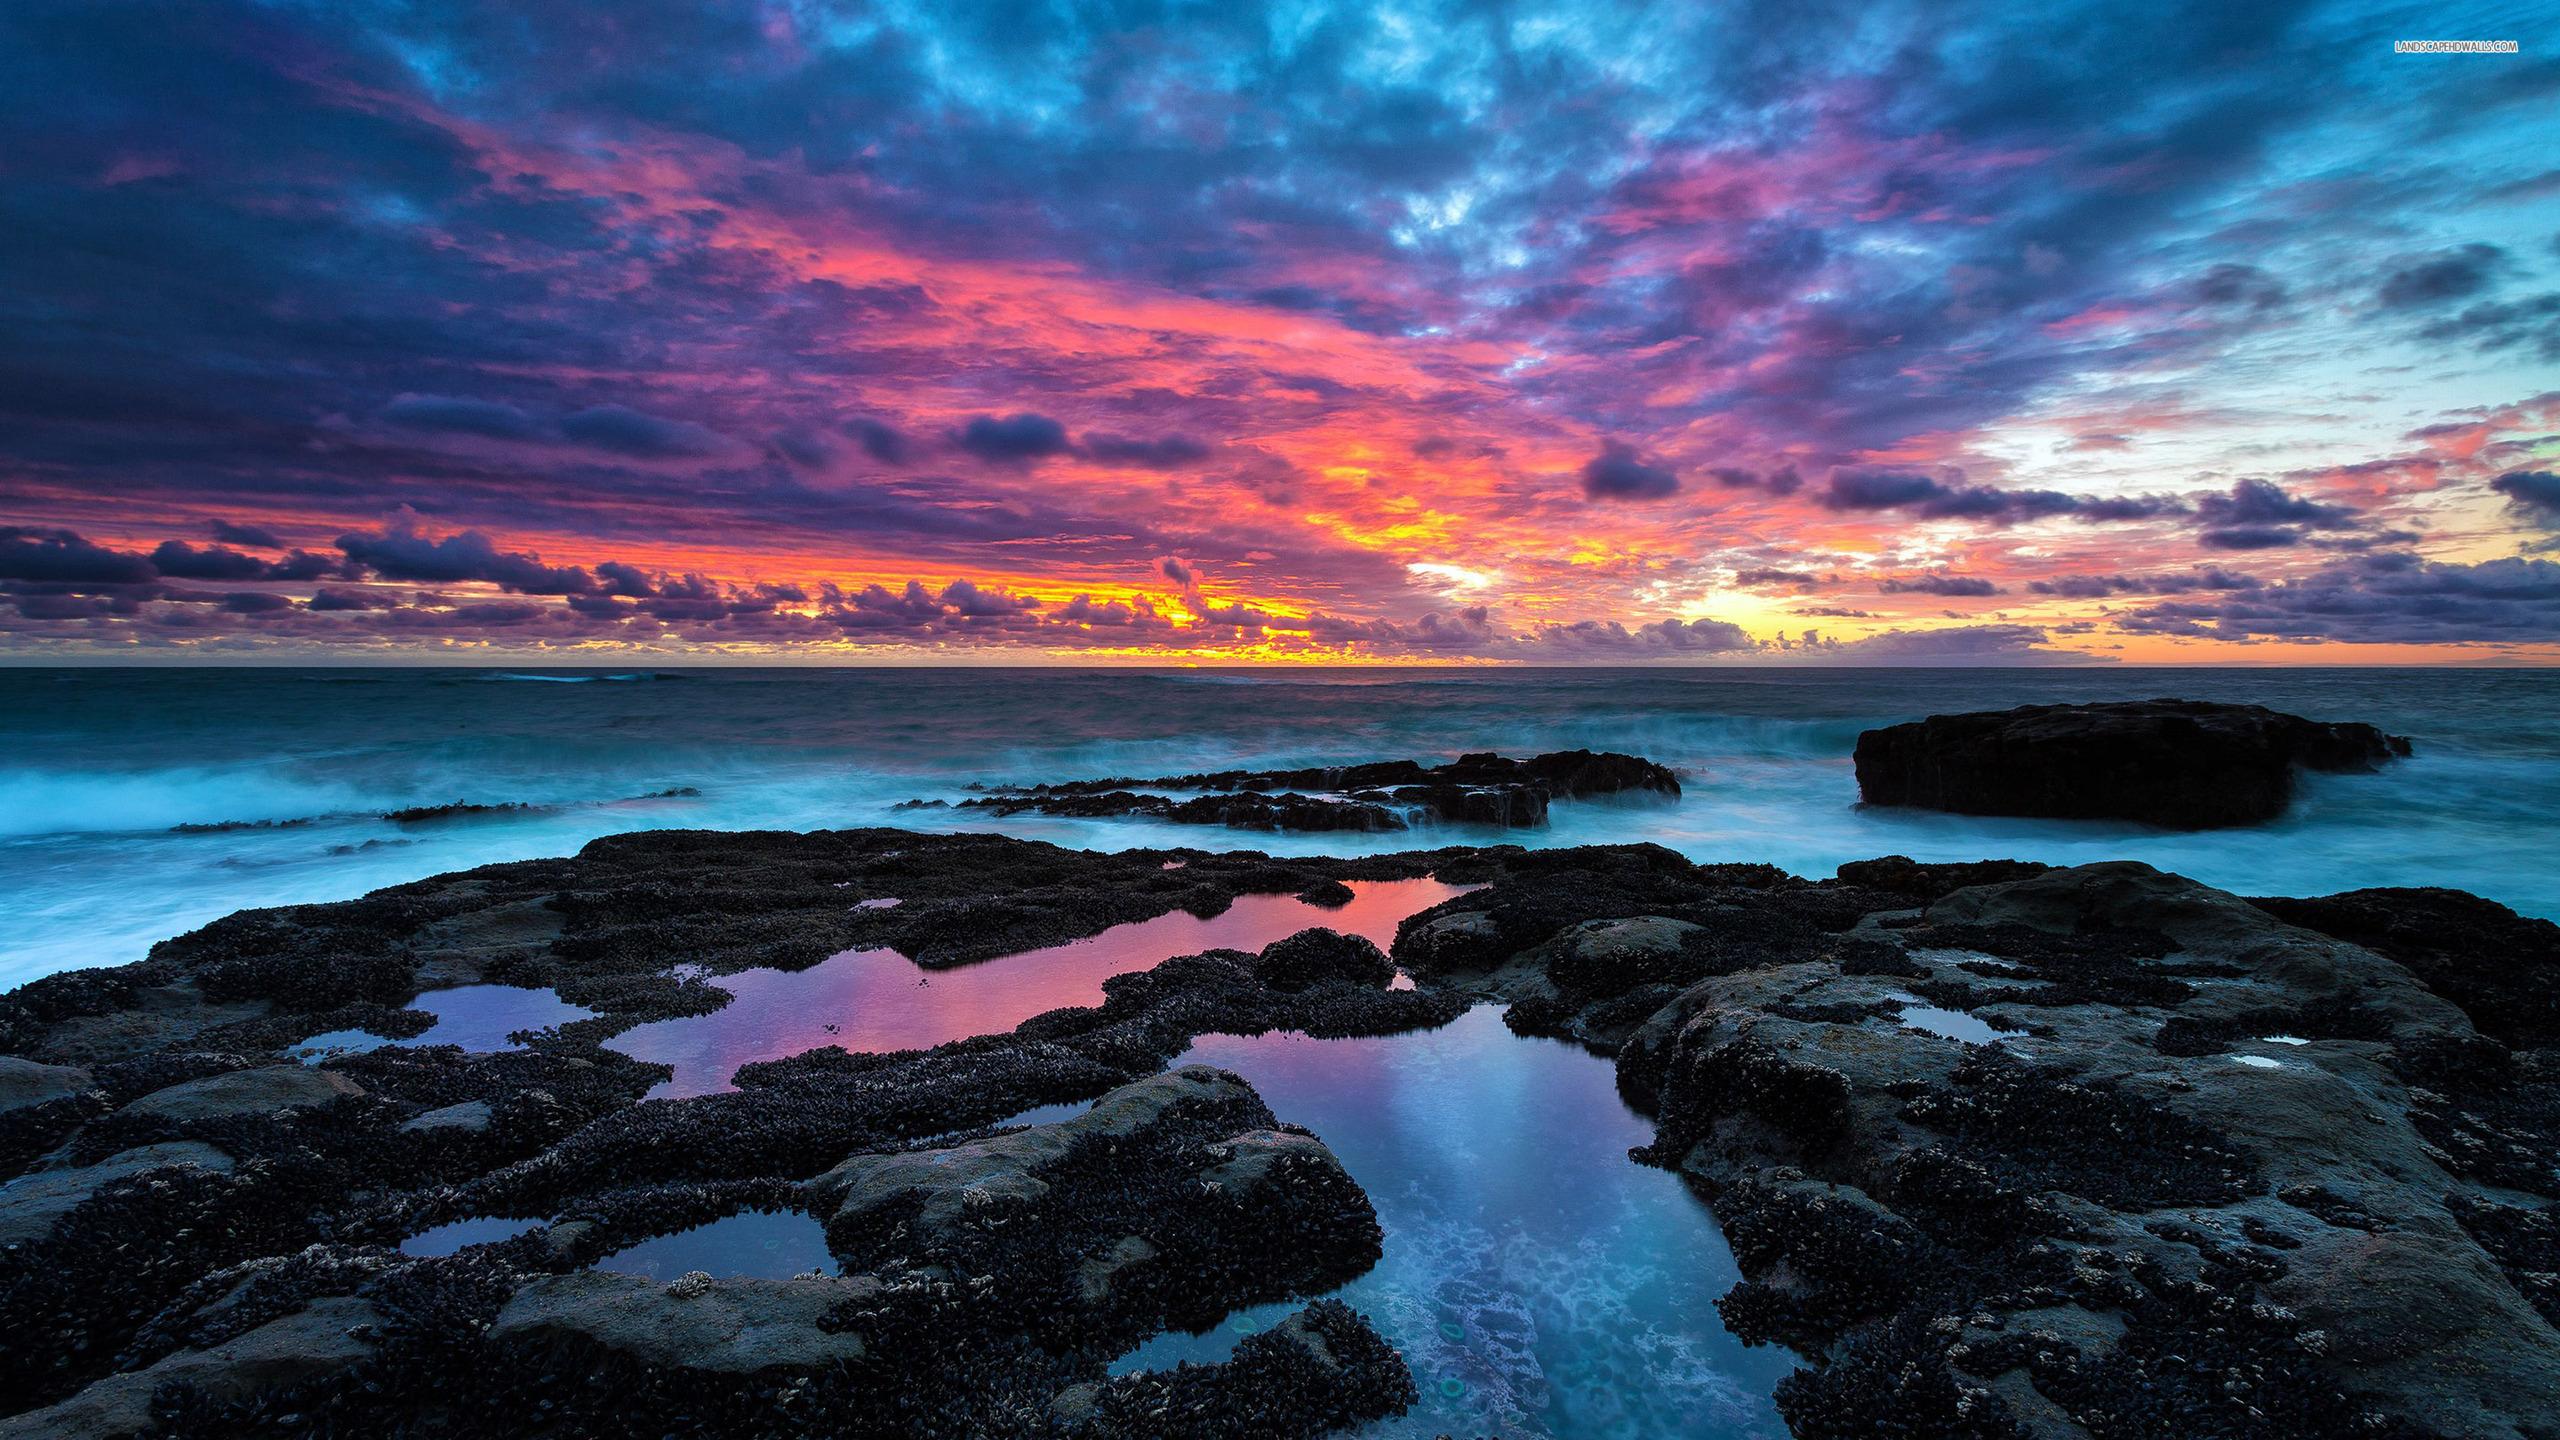 Serene Sunset 33194 1920x1080 px